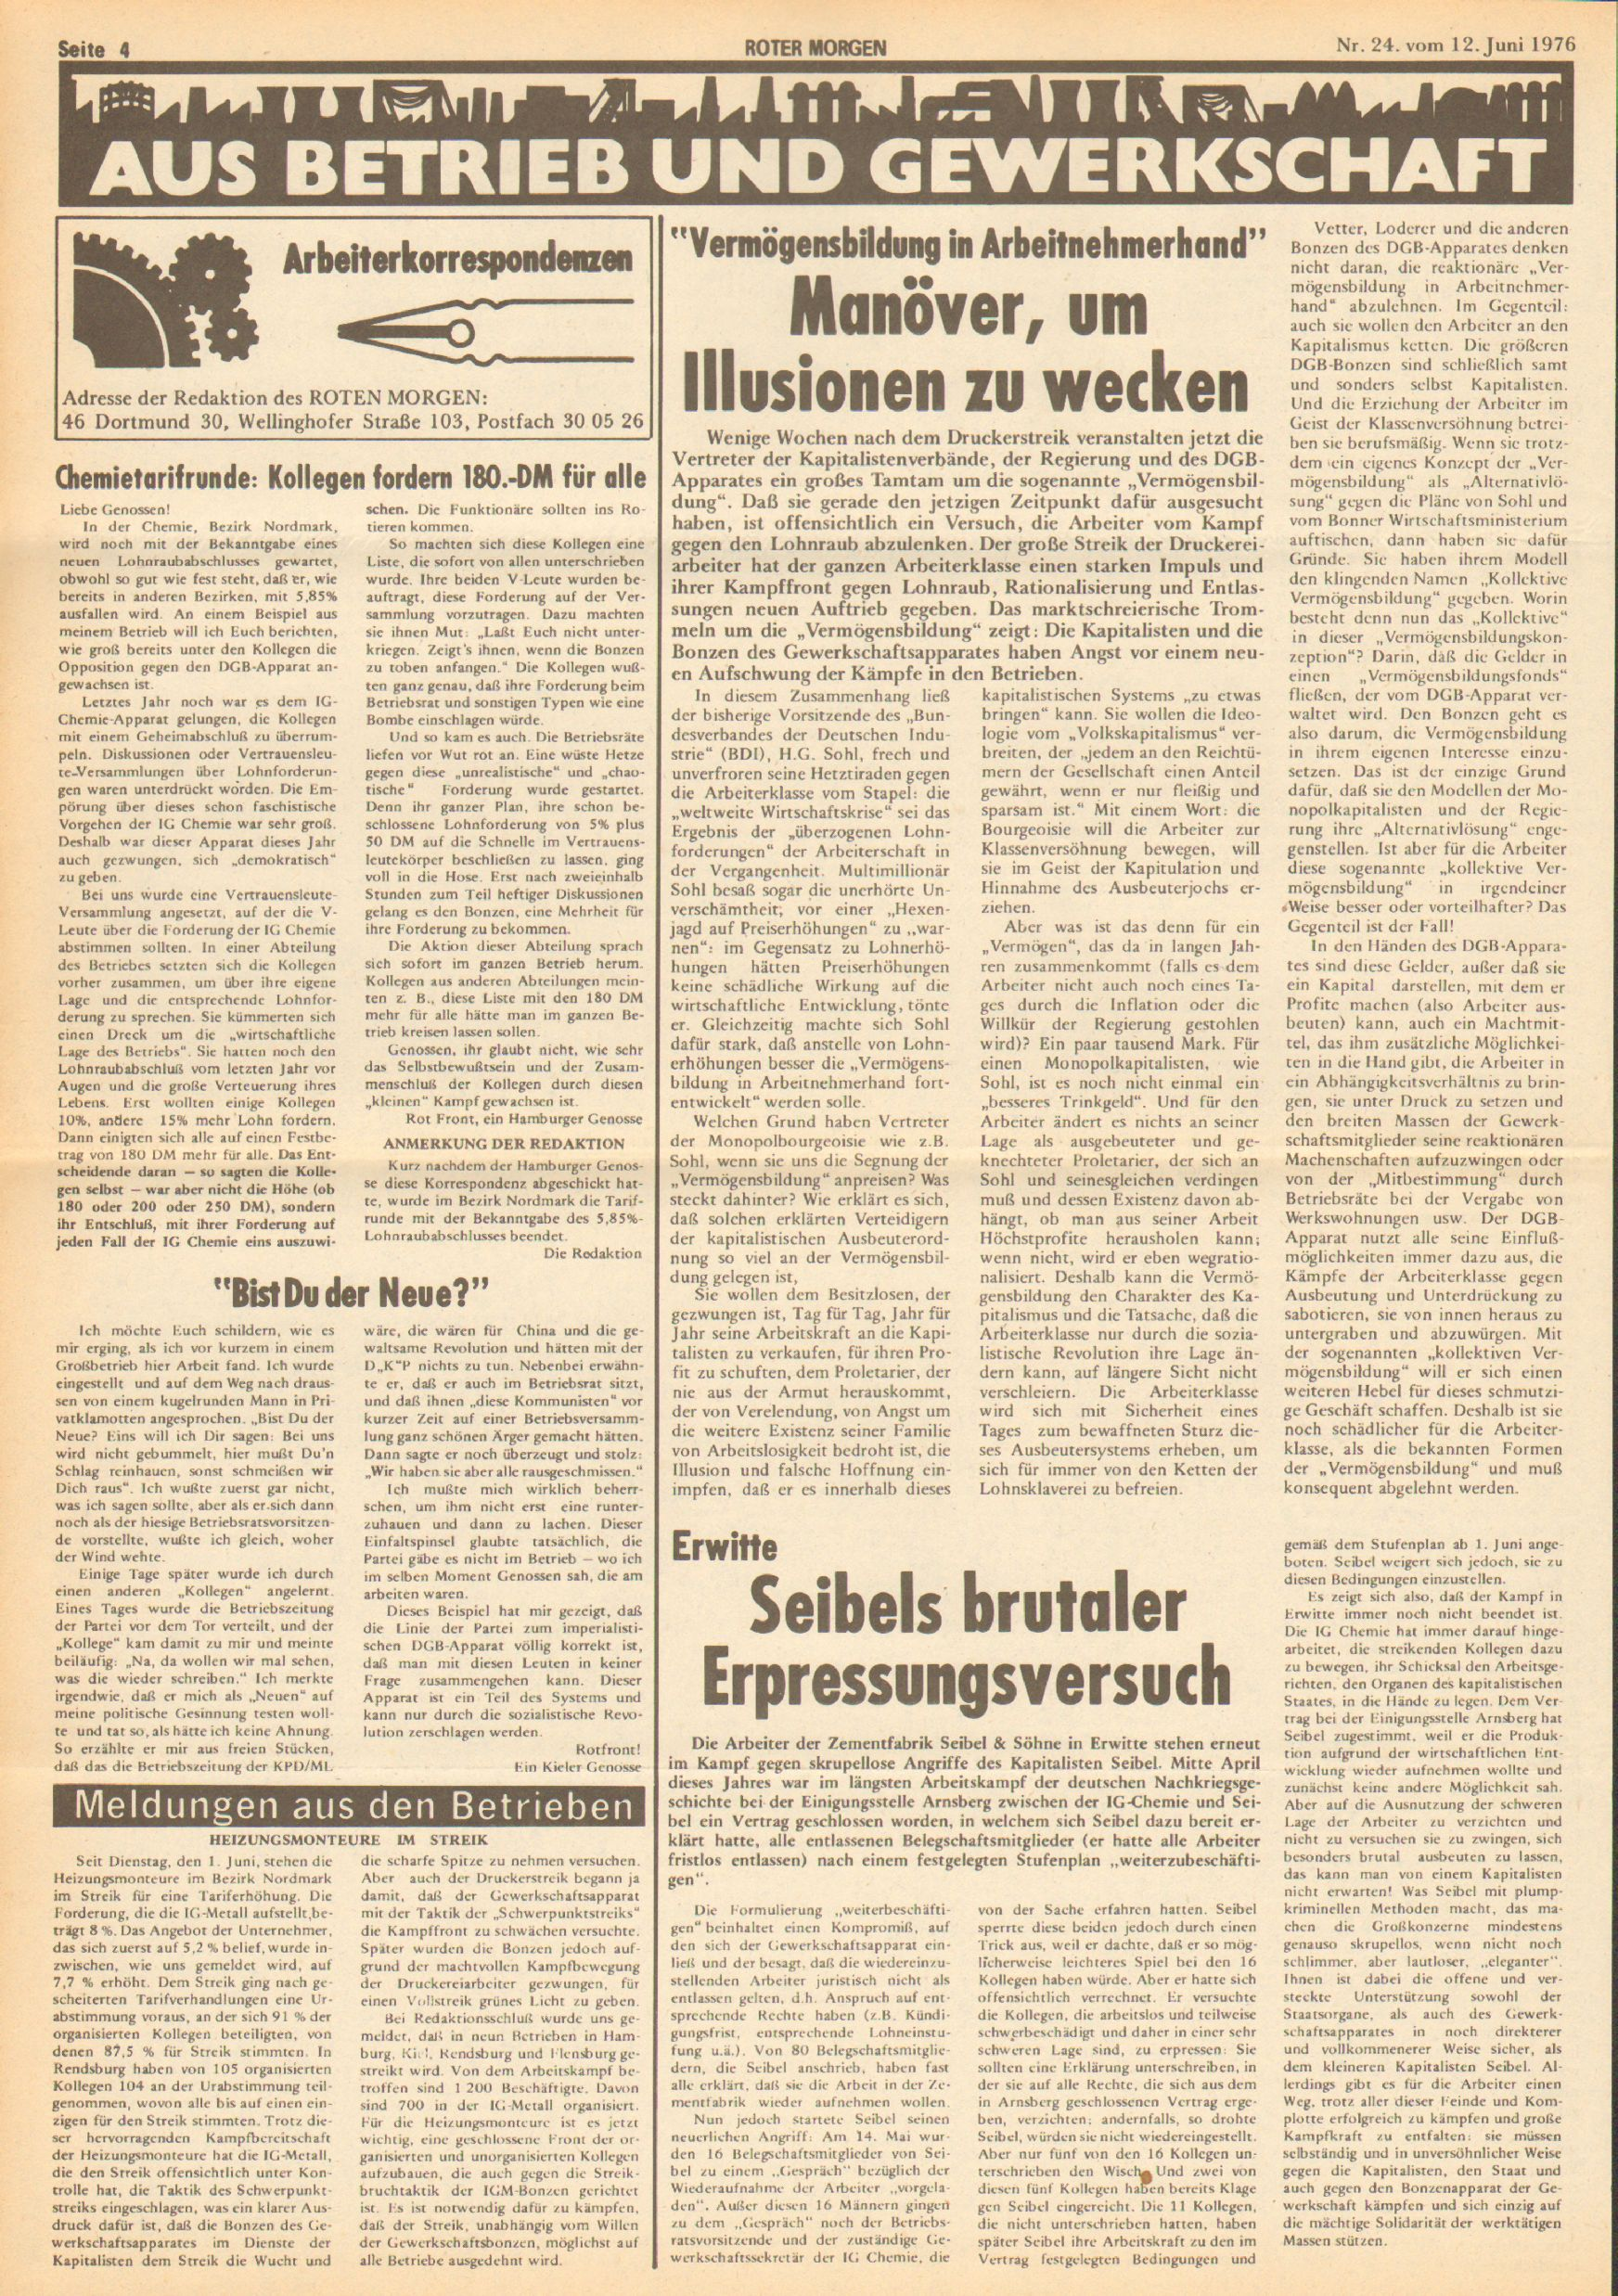 Roter Morgen, 10. Jg., 12. Juni 1976, Nr. 24, Seite 4